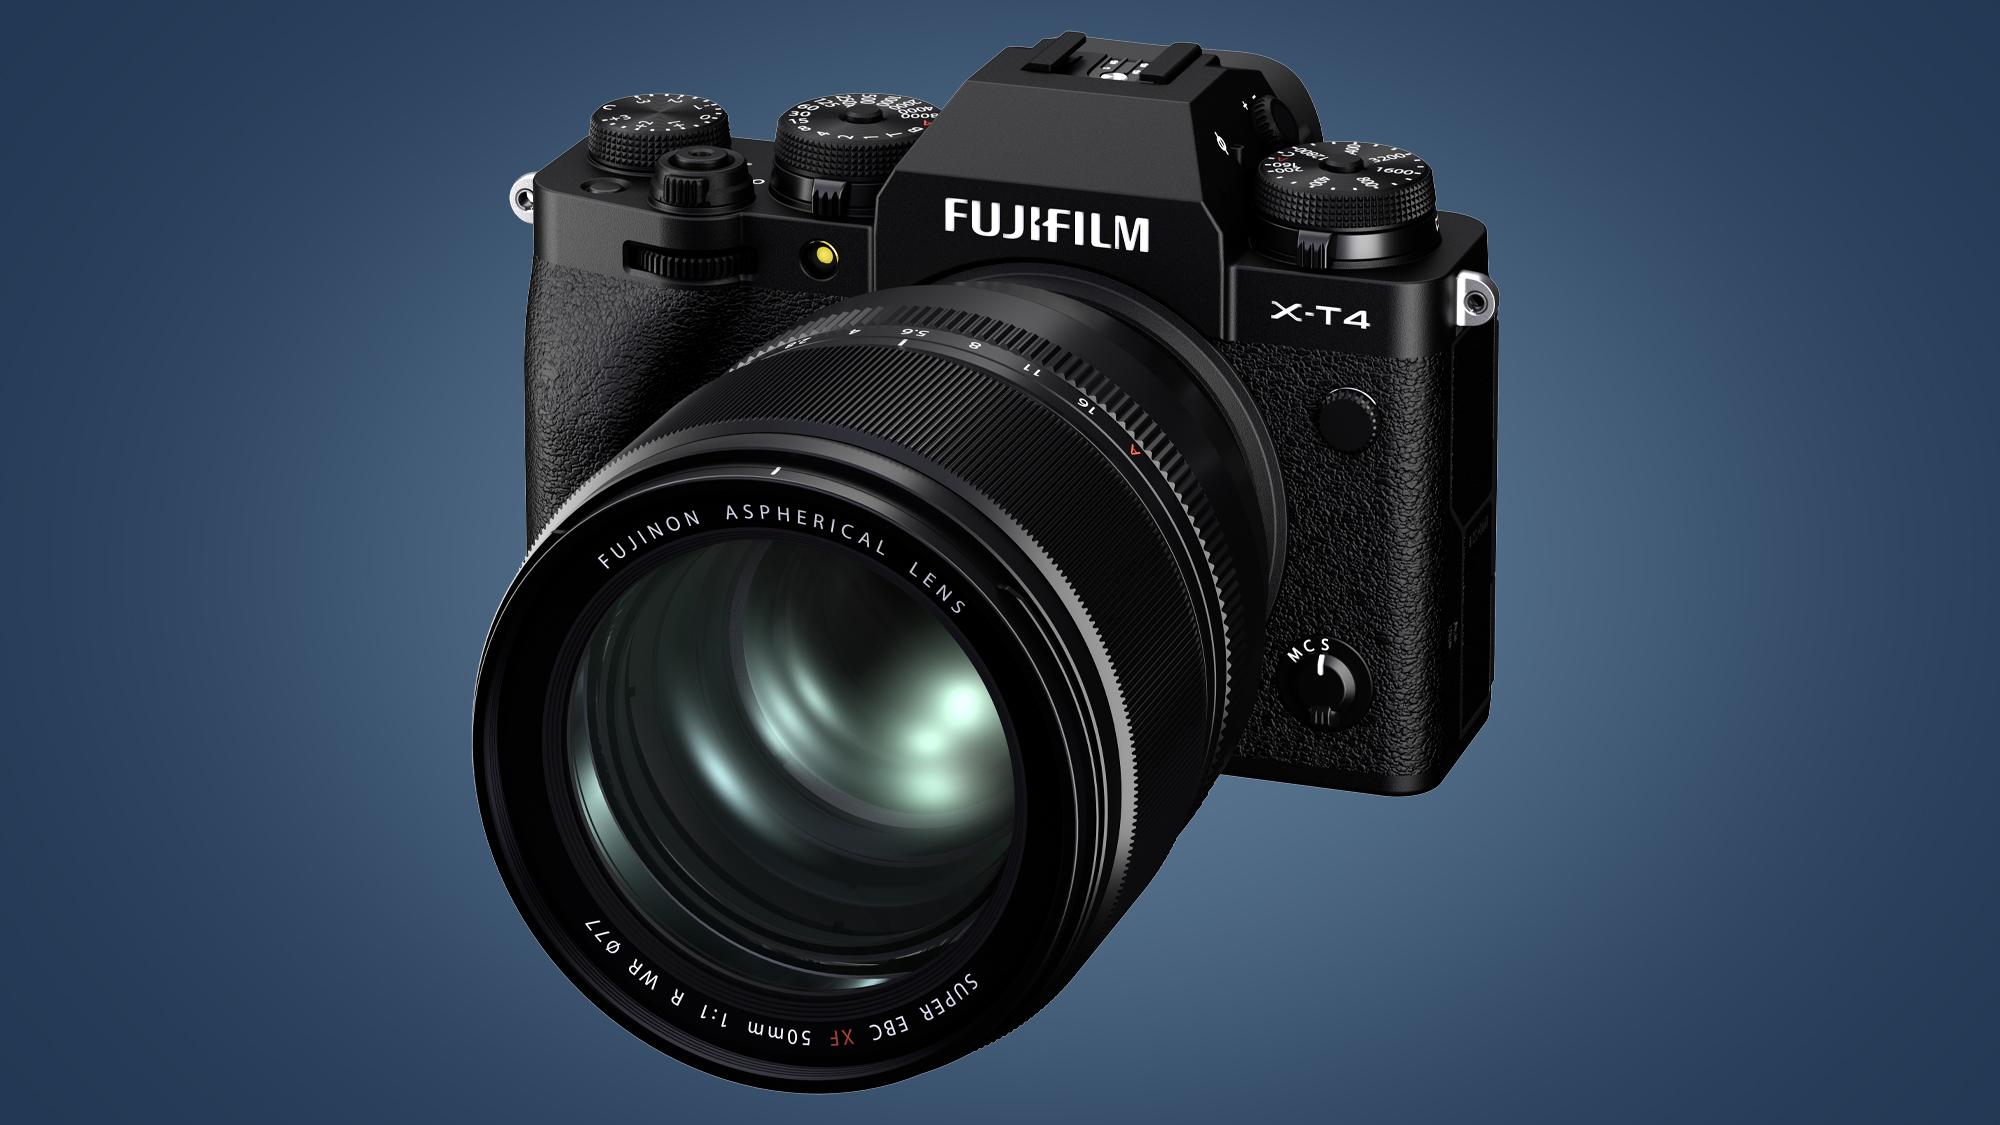 Fujifilm launches world's fastest autofocus lens for mirrorless cameras